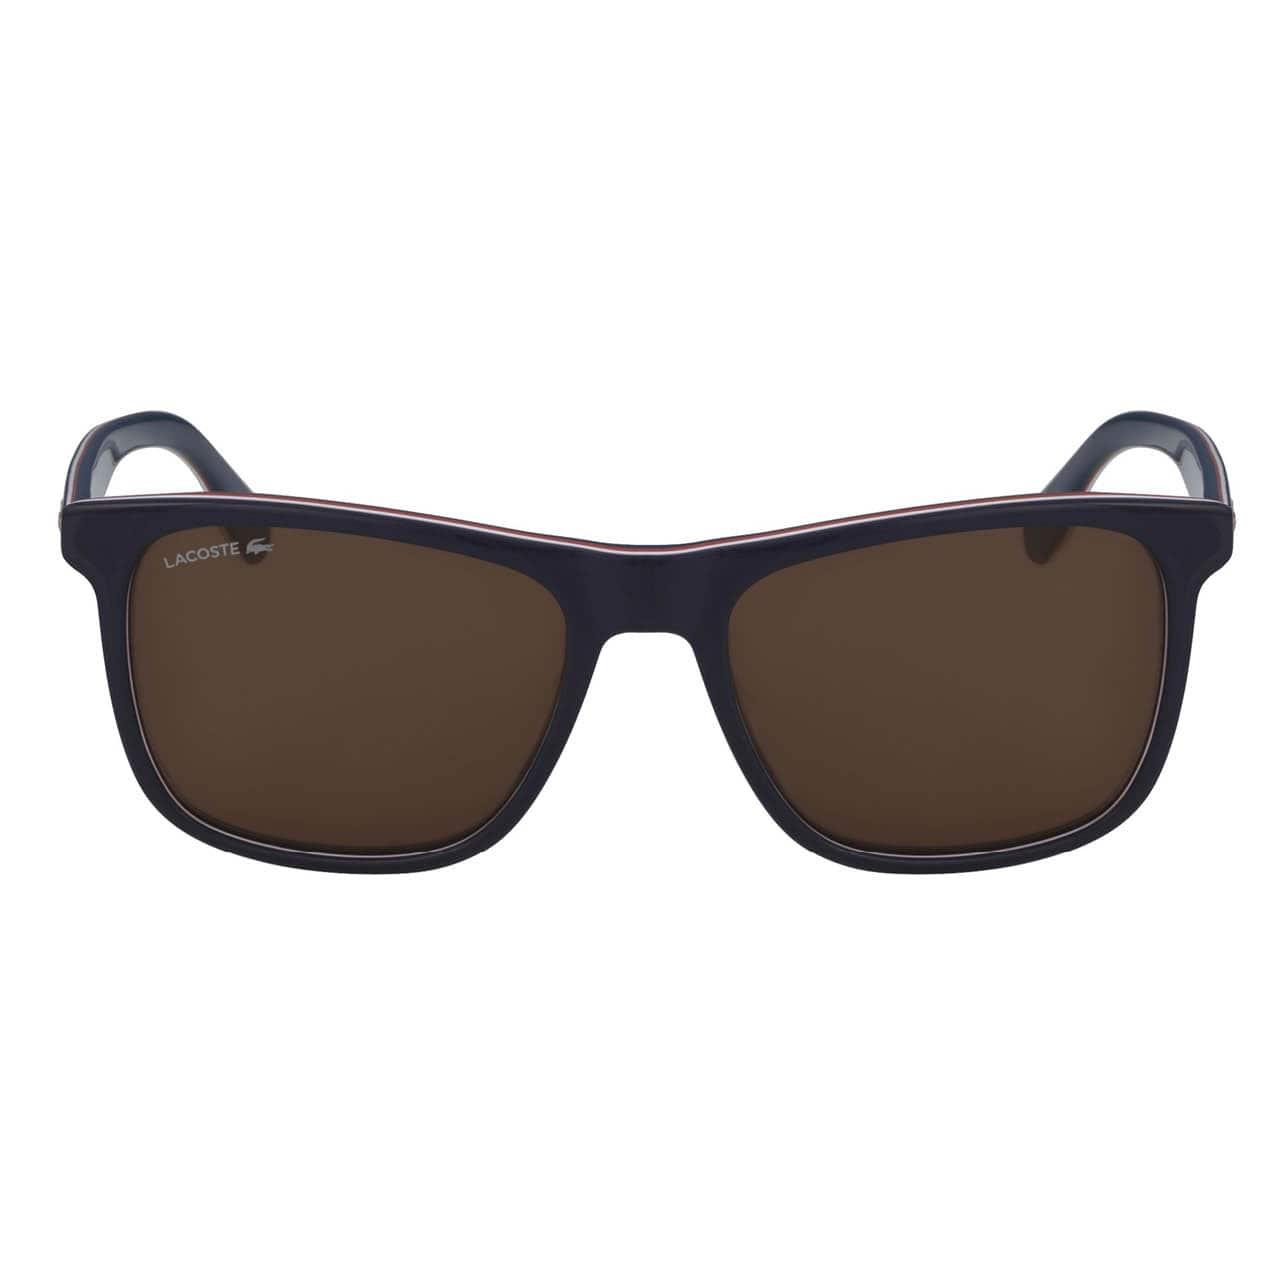 Men's Plastic Square Stripes & Piping Sunglasses